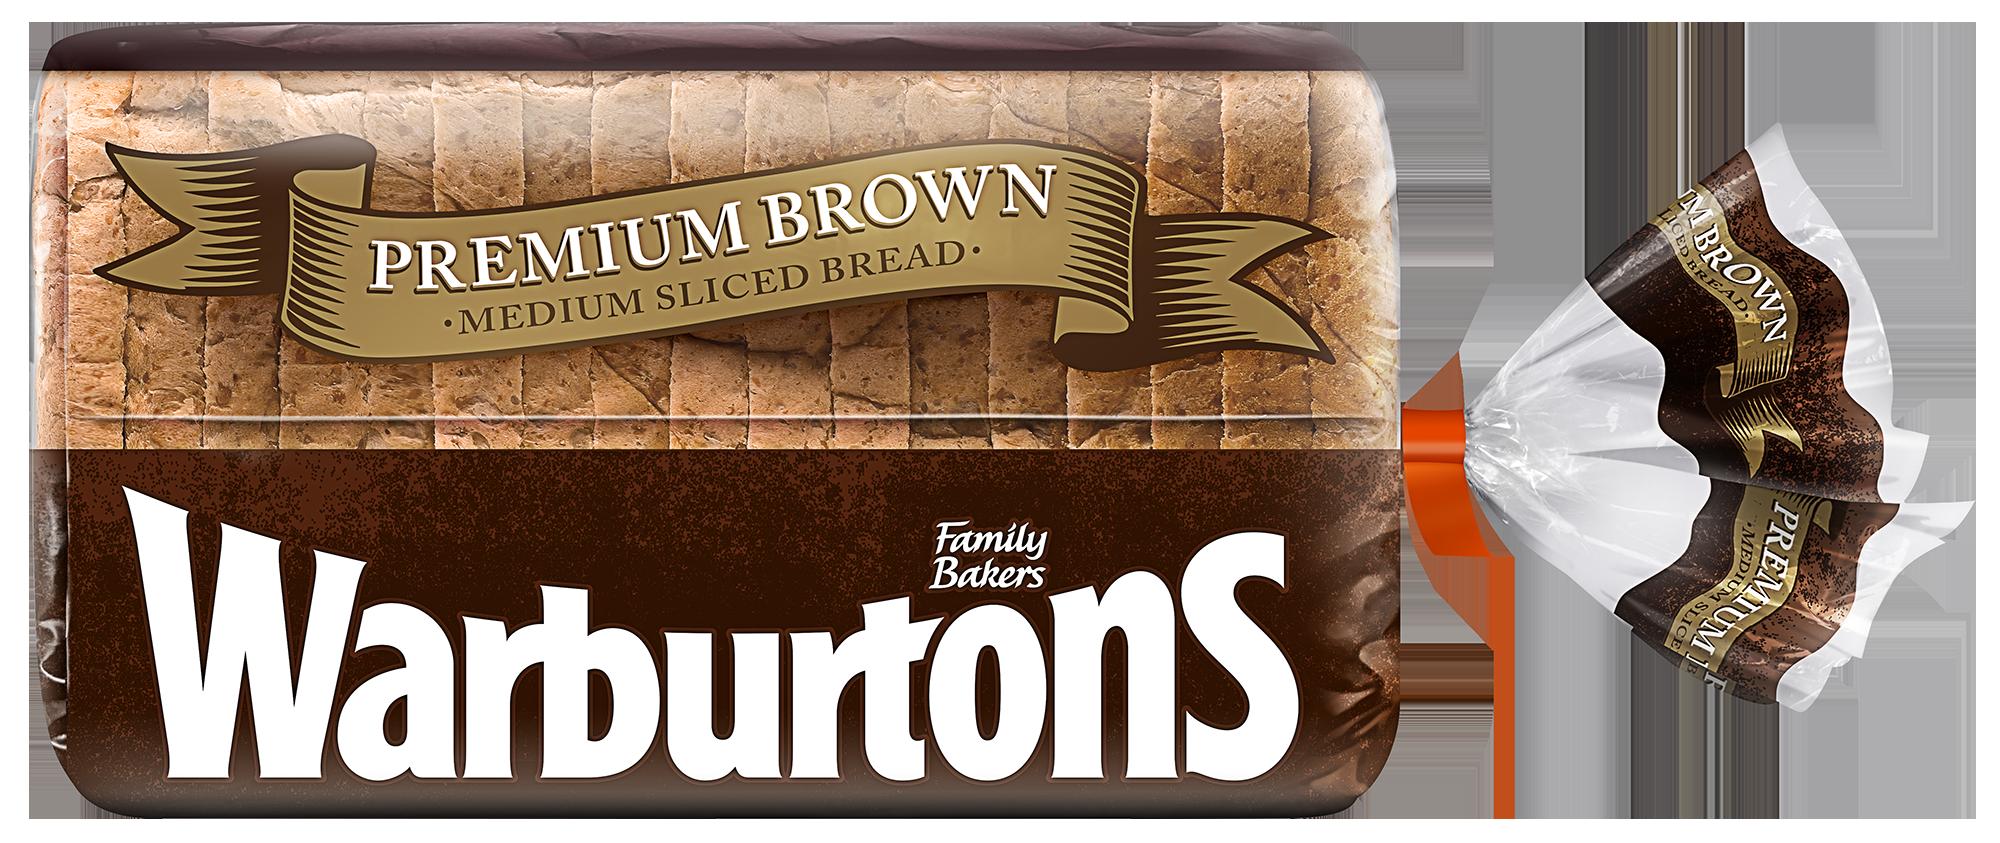 Warburtons Premium Brown